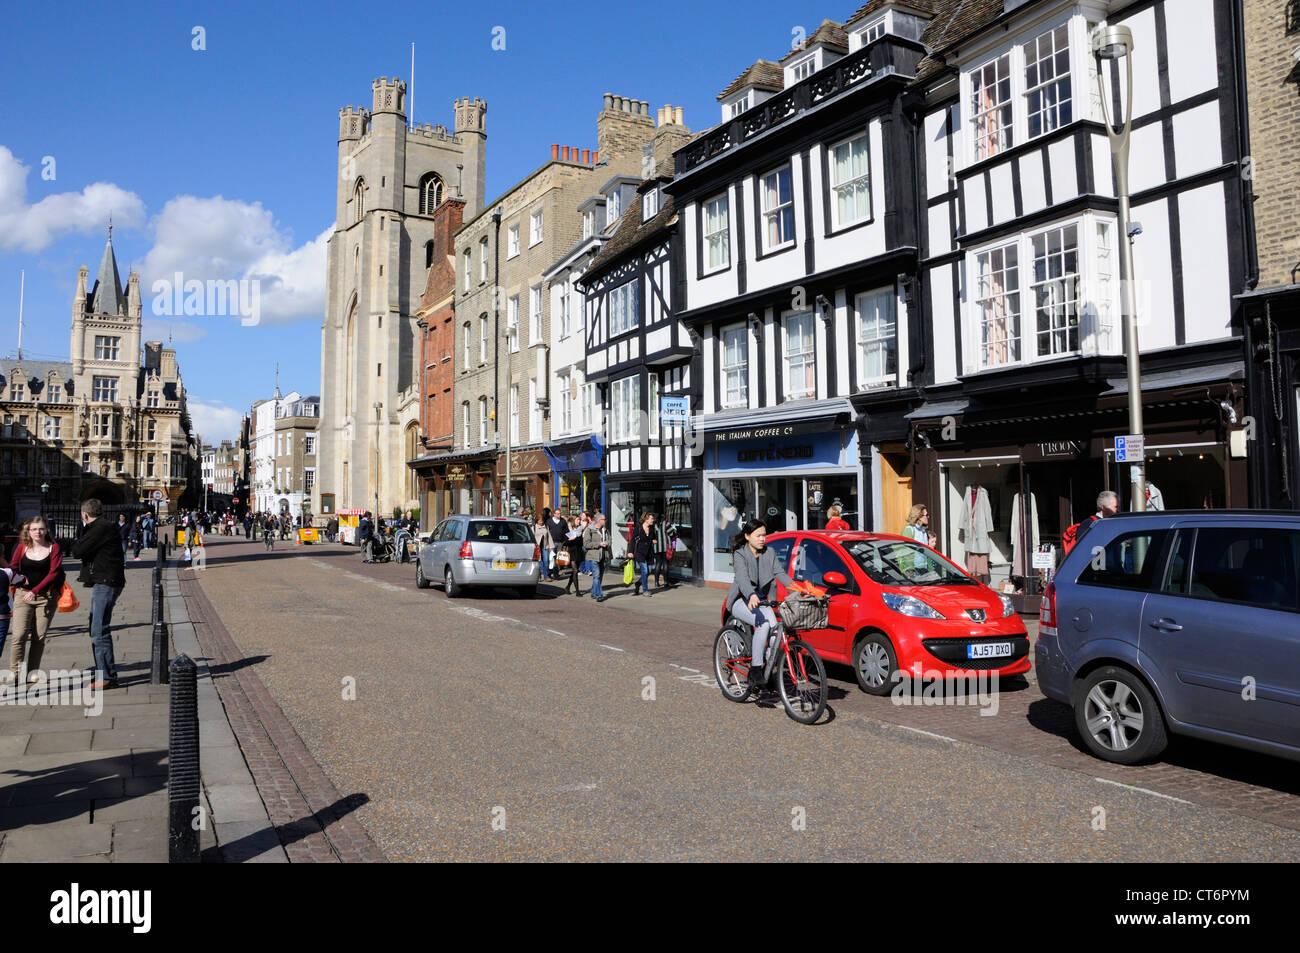 King's Parade, Cambridge - Stock Image